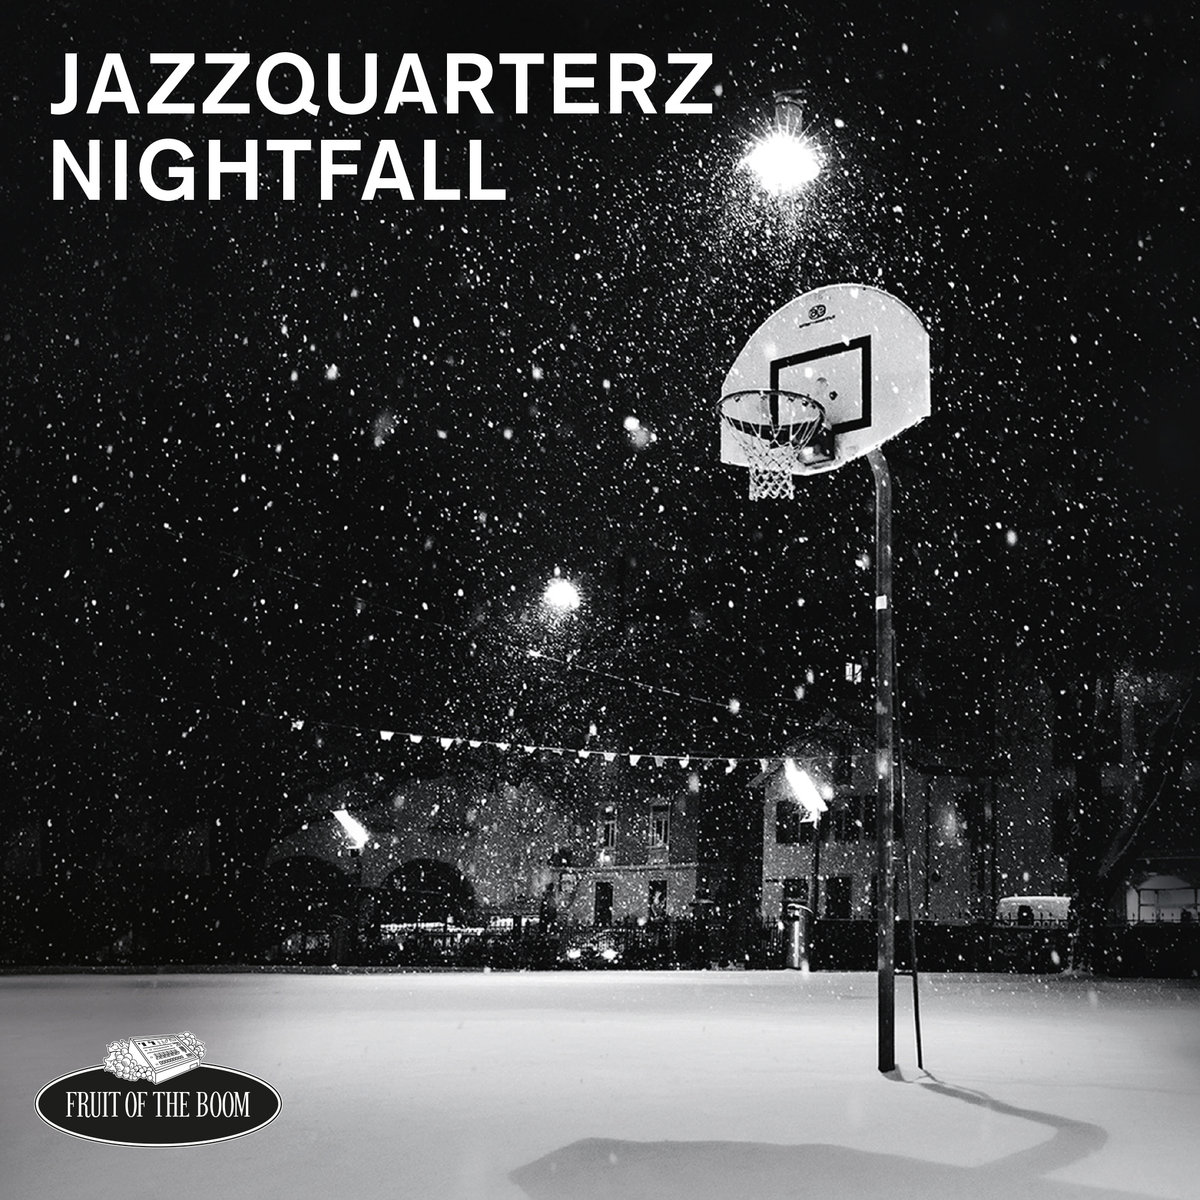 Nightfall_jazzquarterz